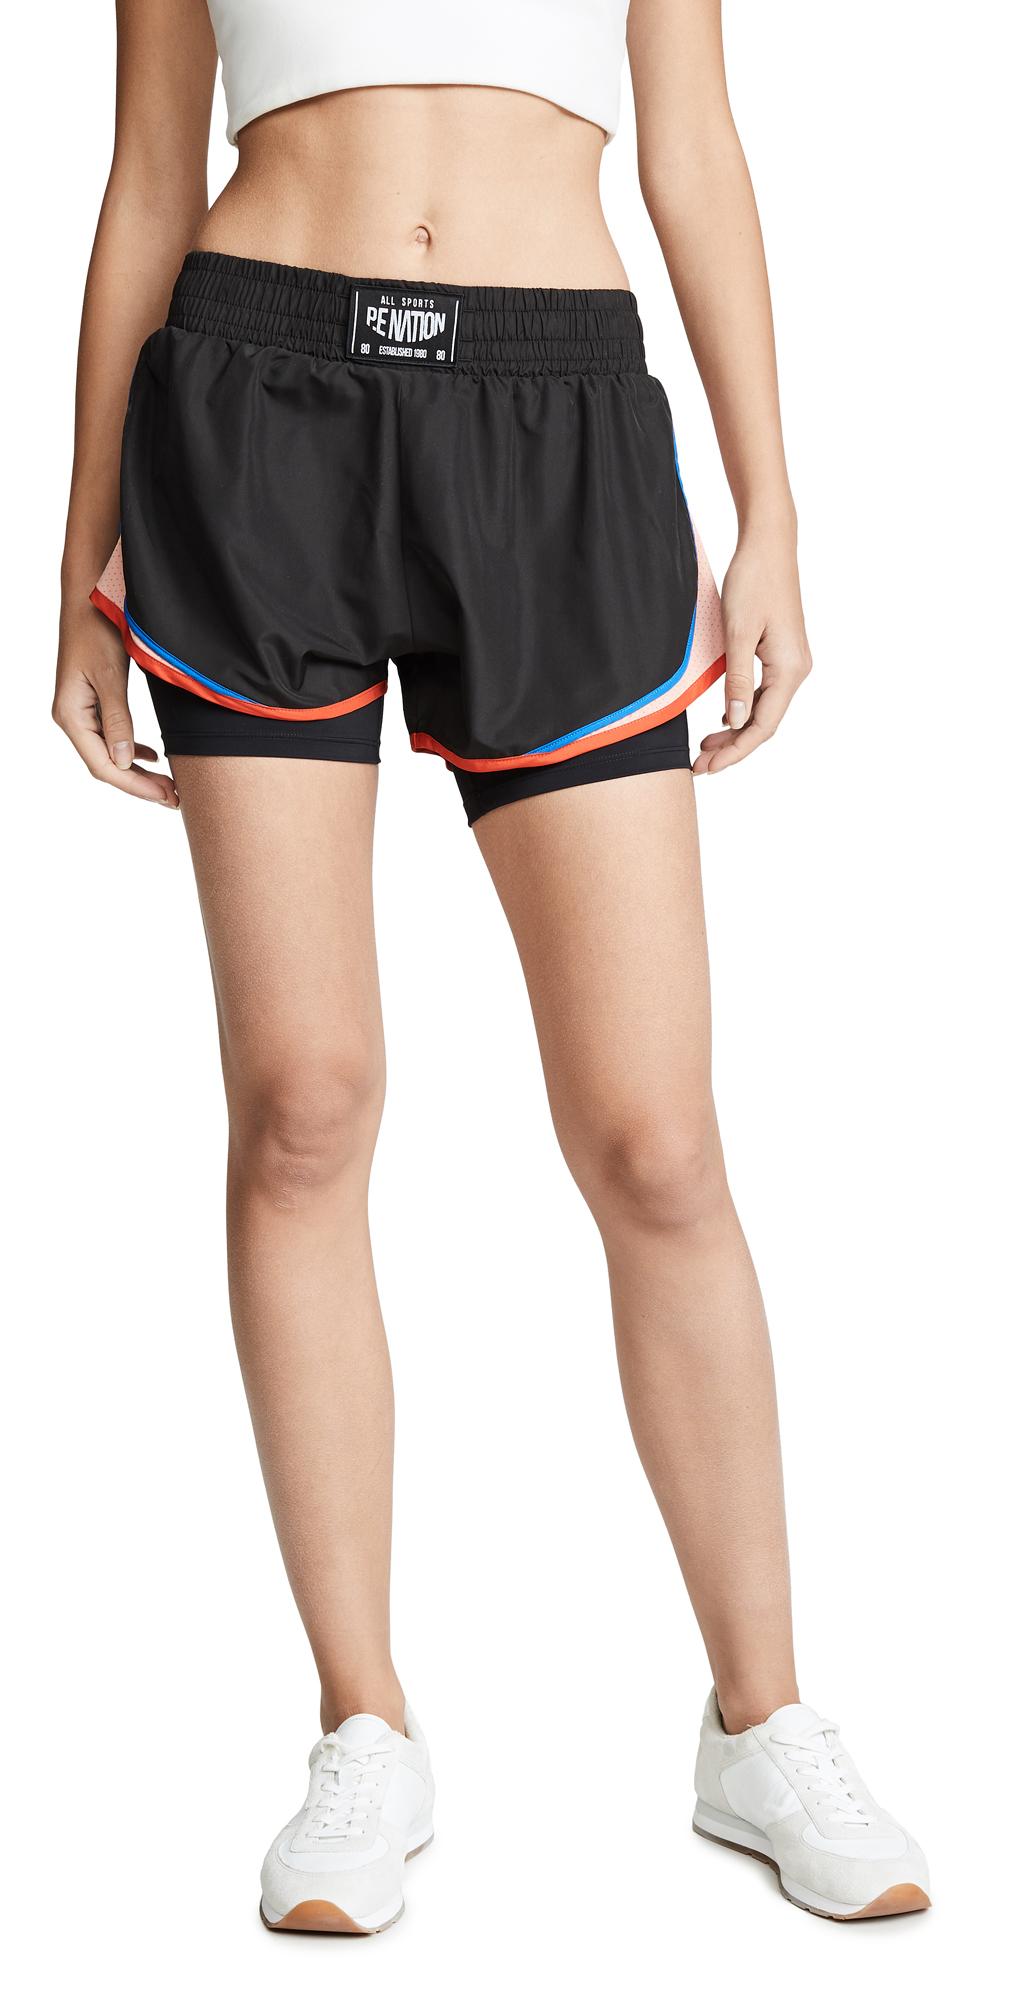 BOOM Prime Mens Short Pyjamas Men/'s T-shirt Top /& Shorts PJs Matching Set